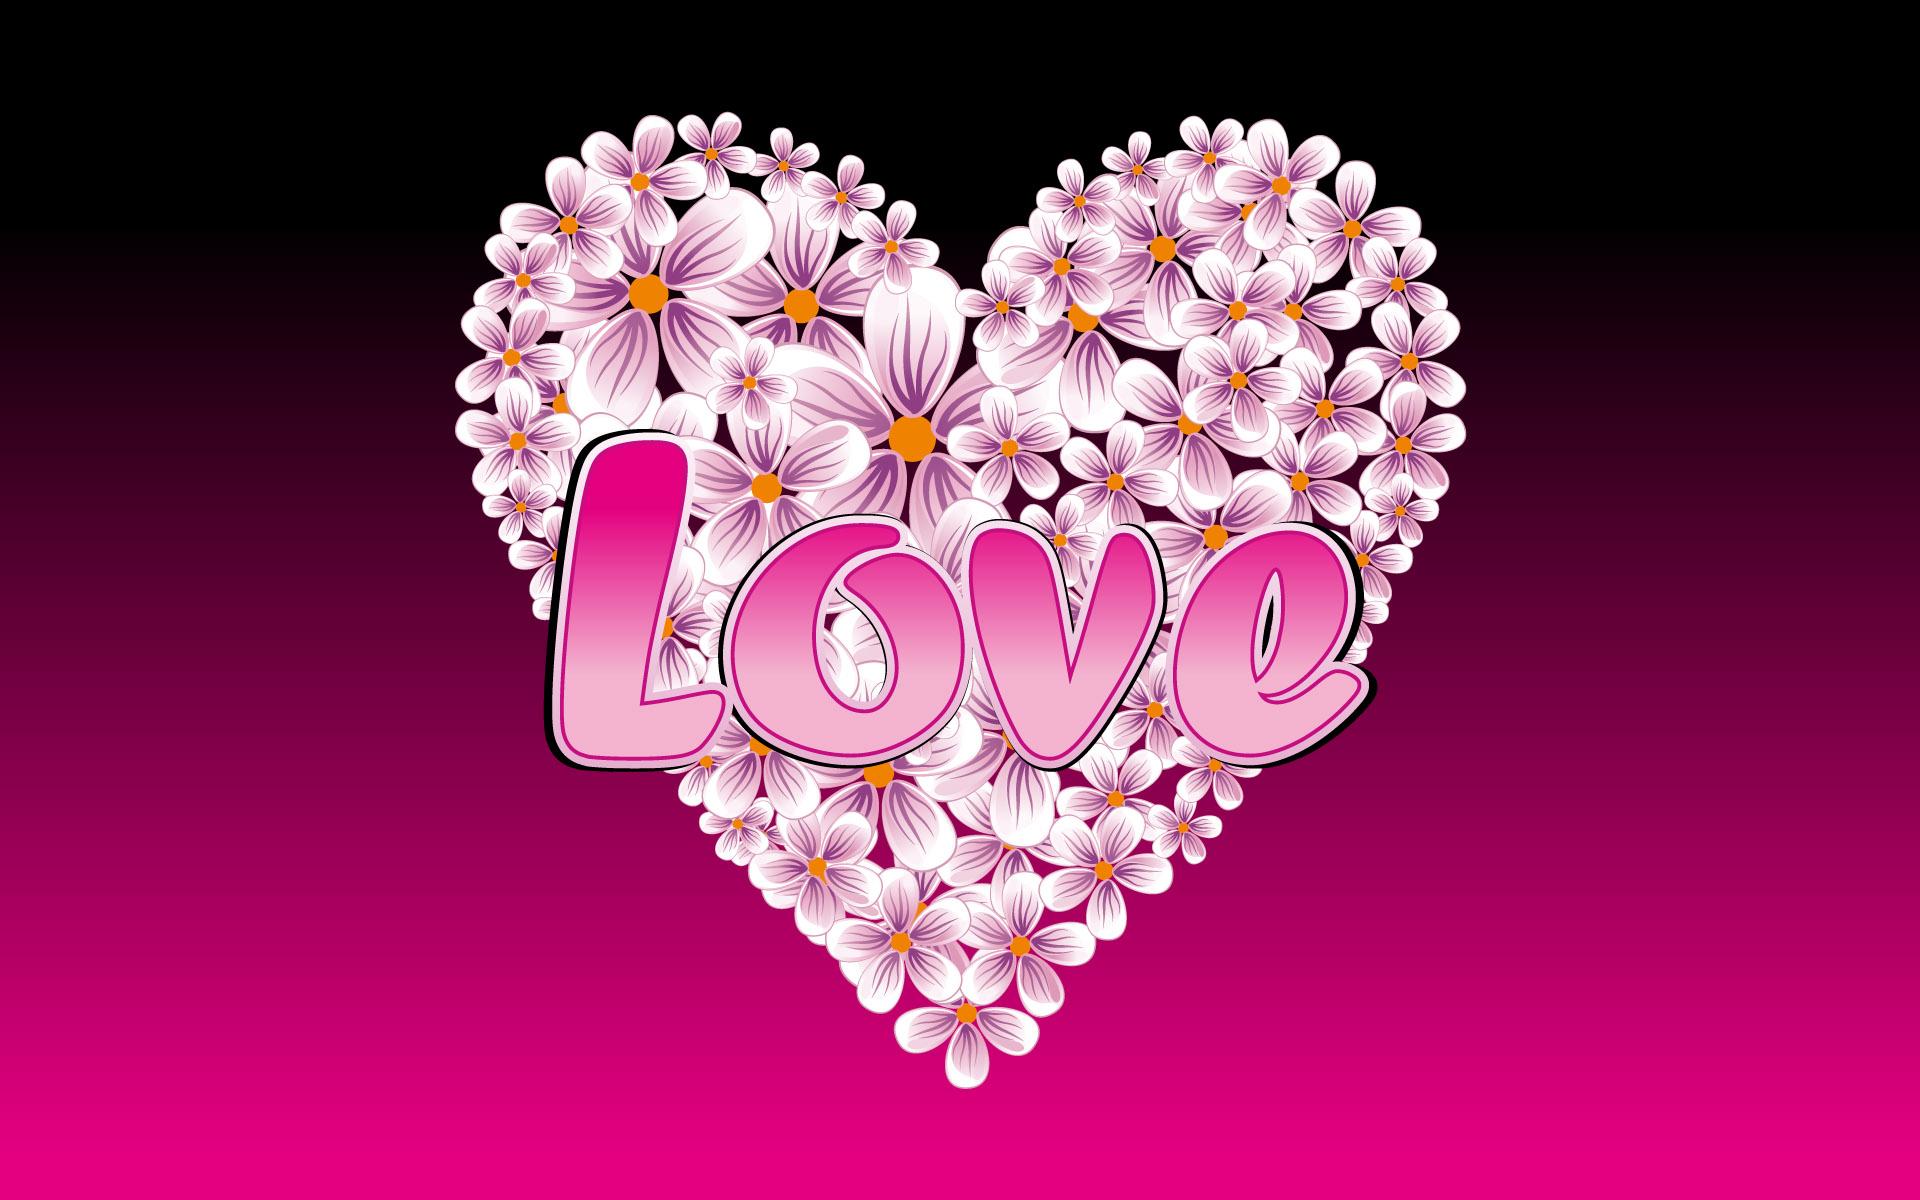 13161 Coeur Love Wallpaper Fond Ecran Image Photo